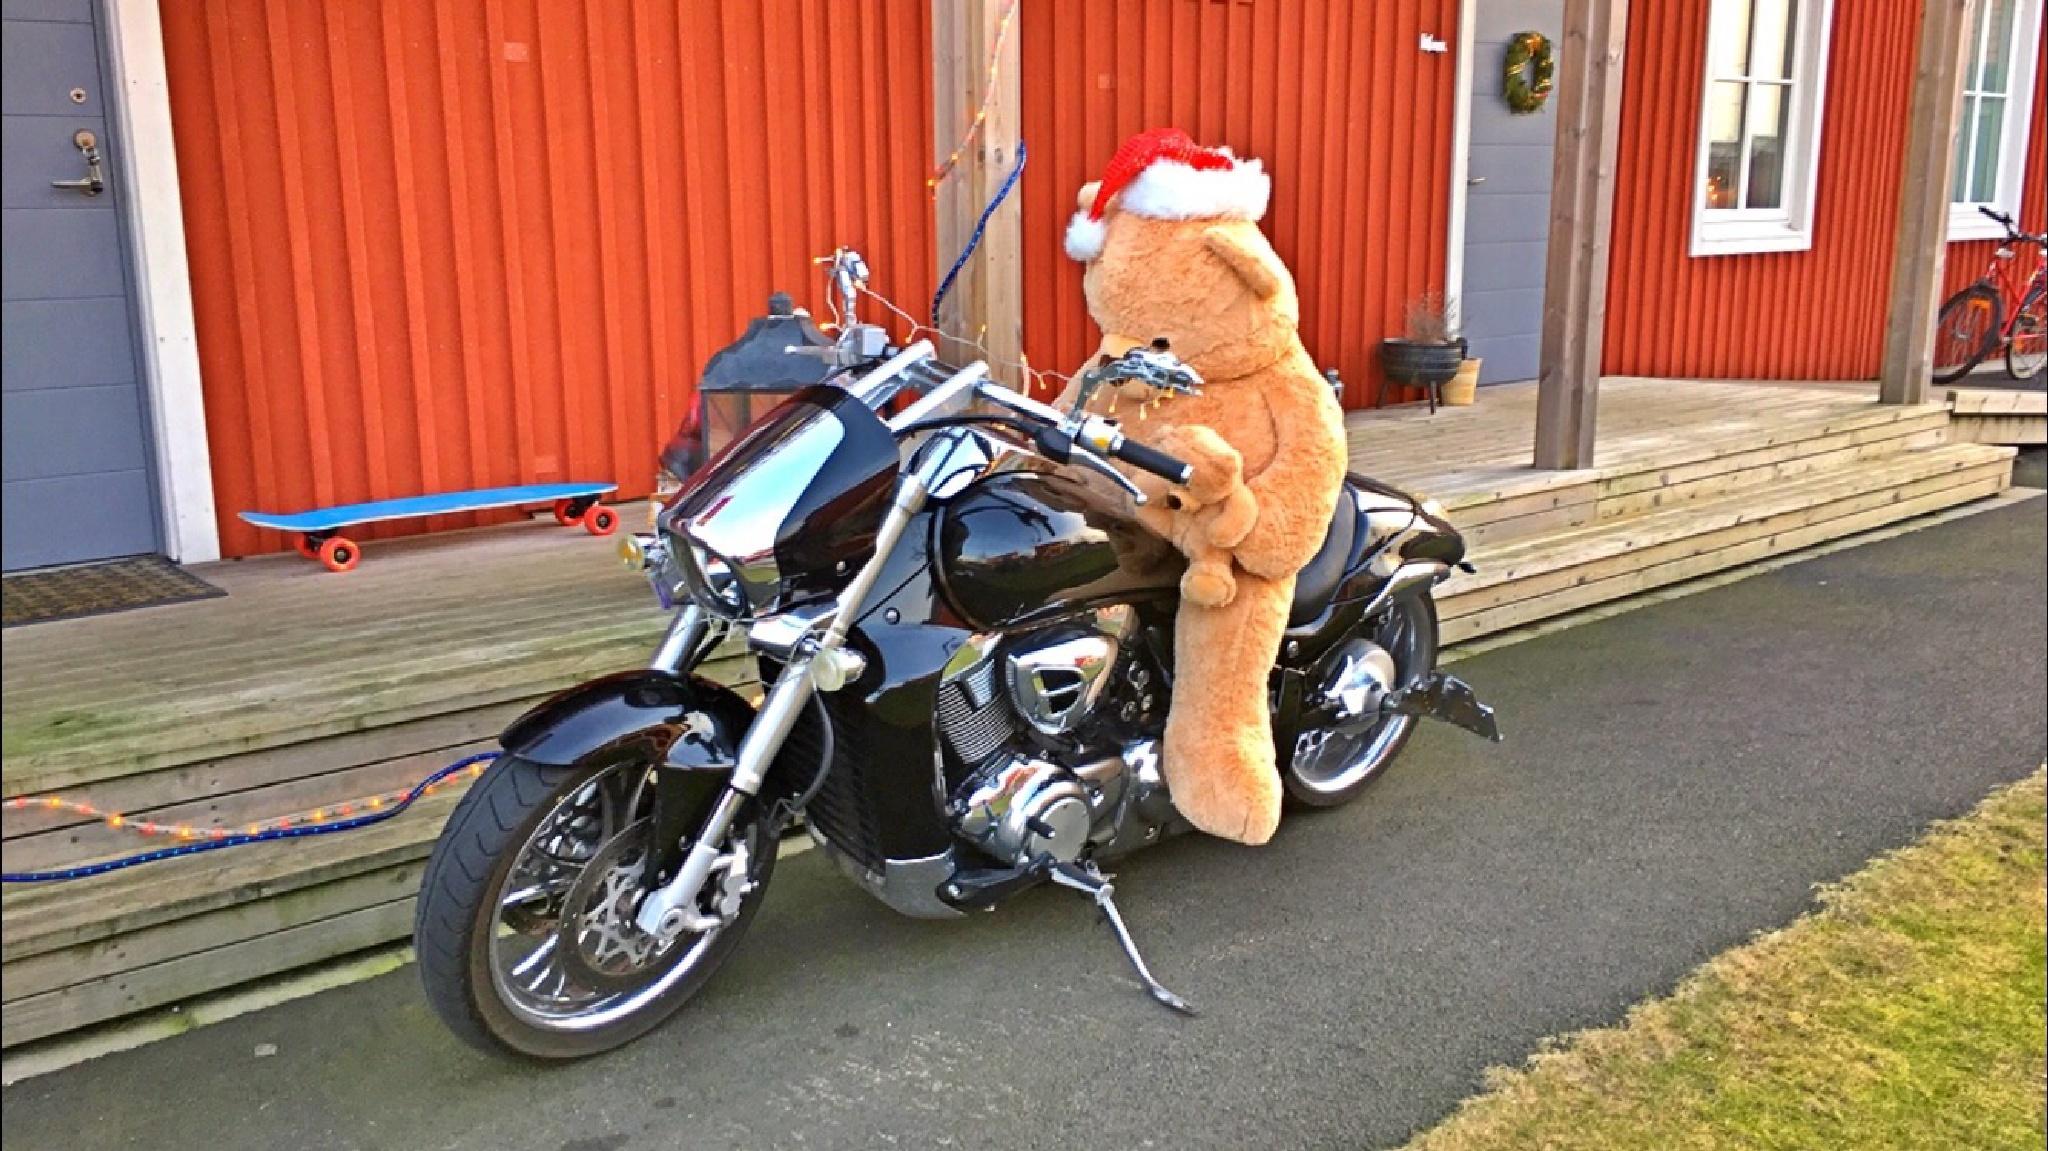 Teddy Santa by Johan Meding